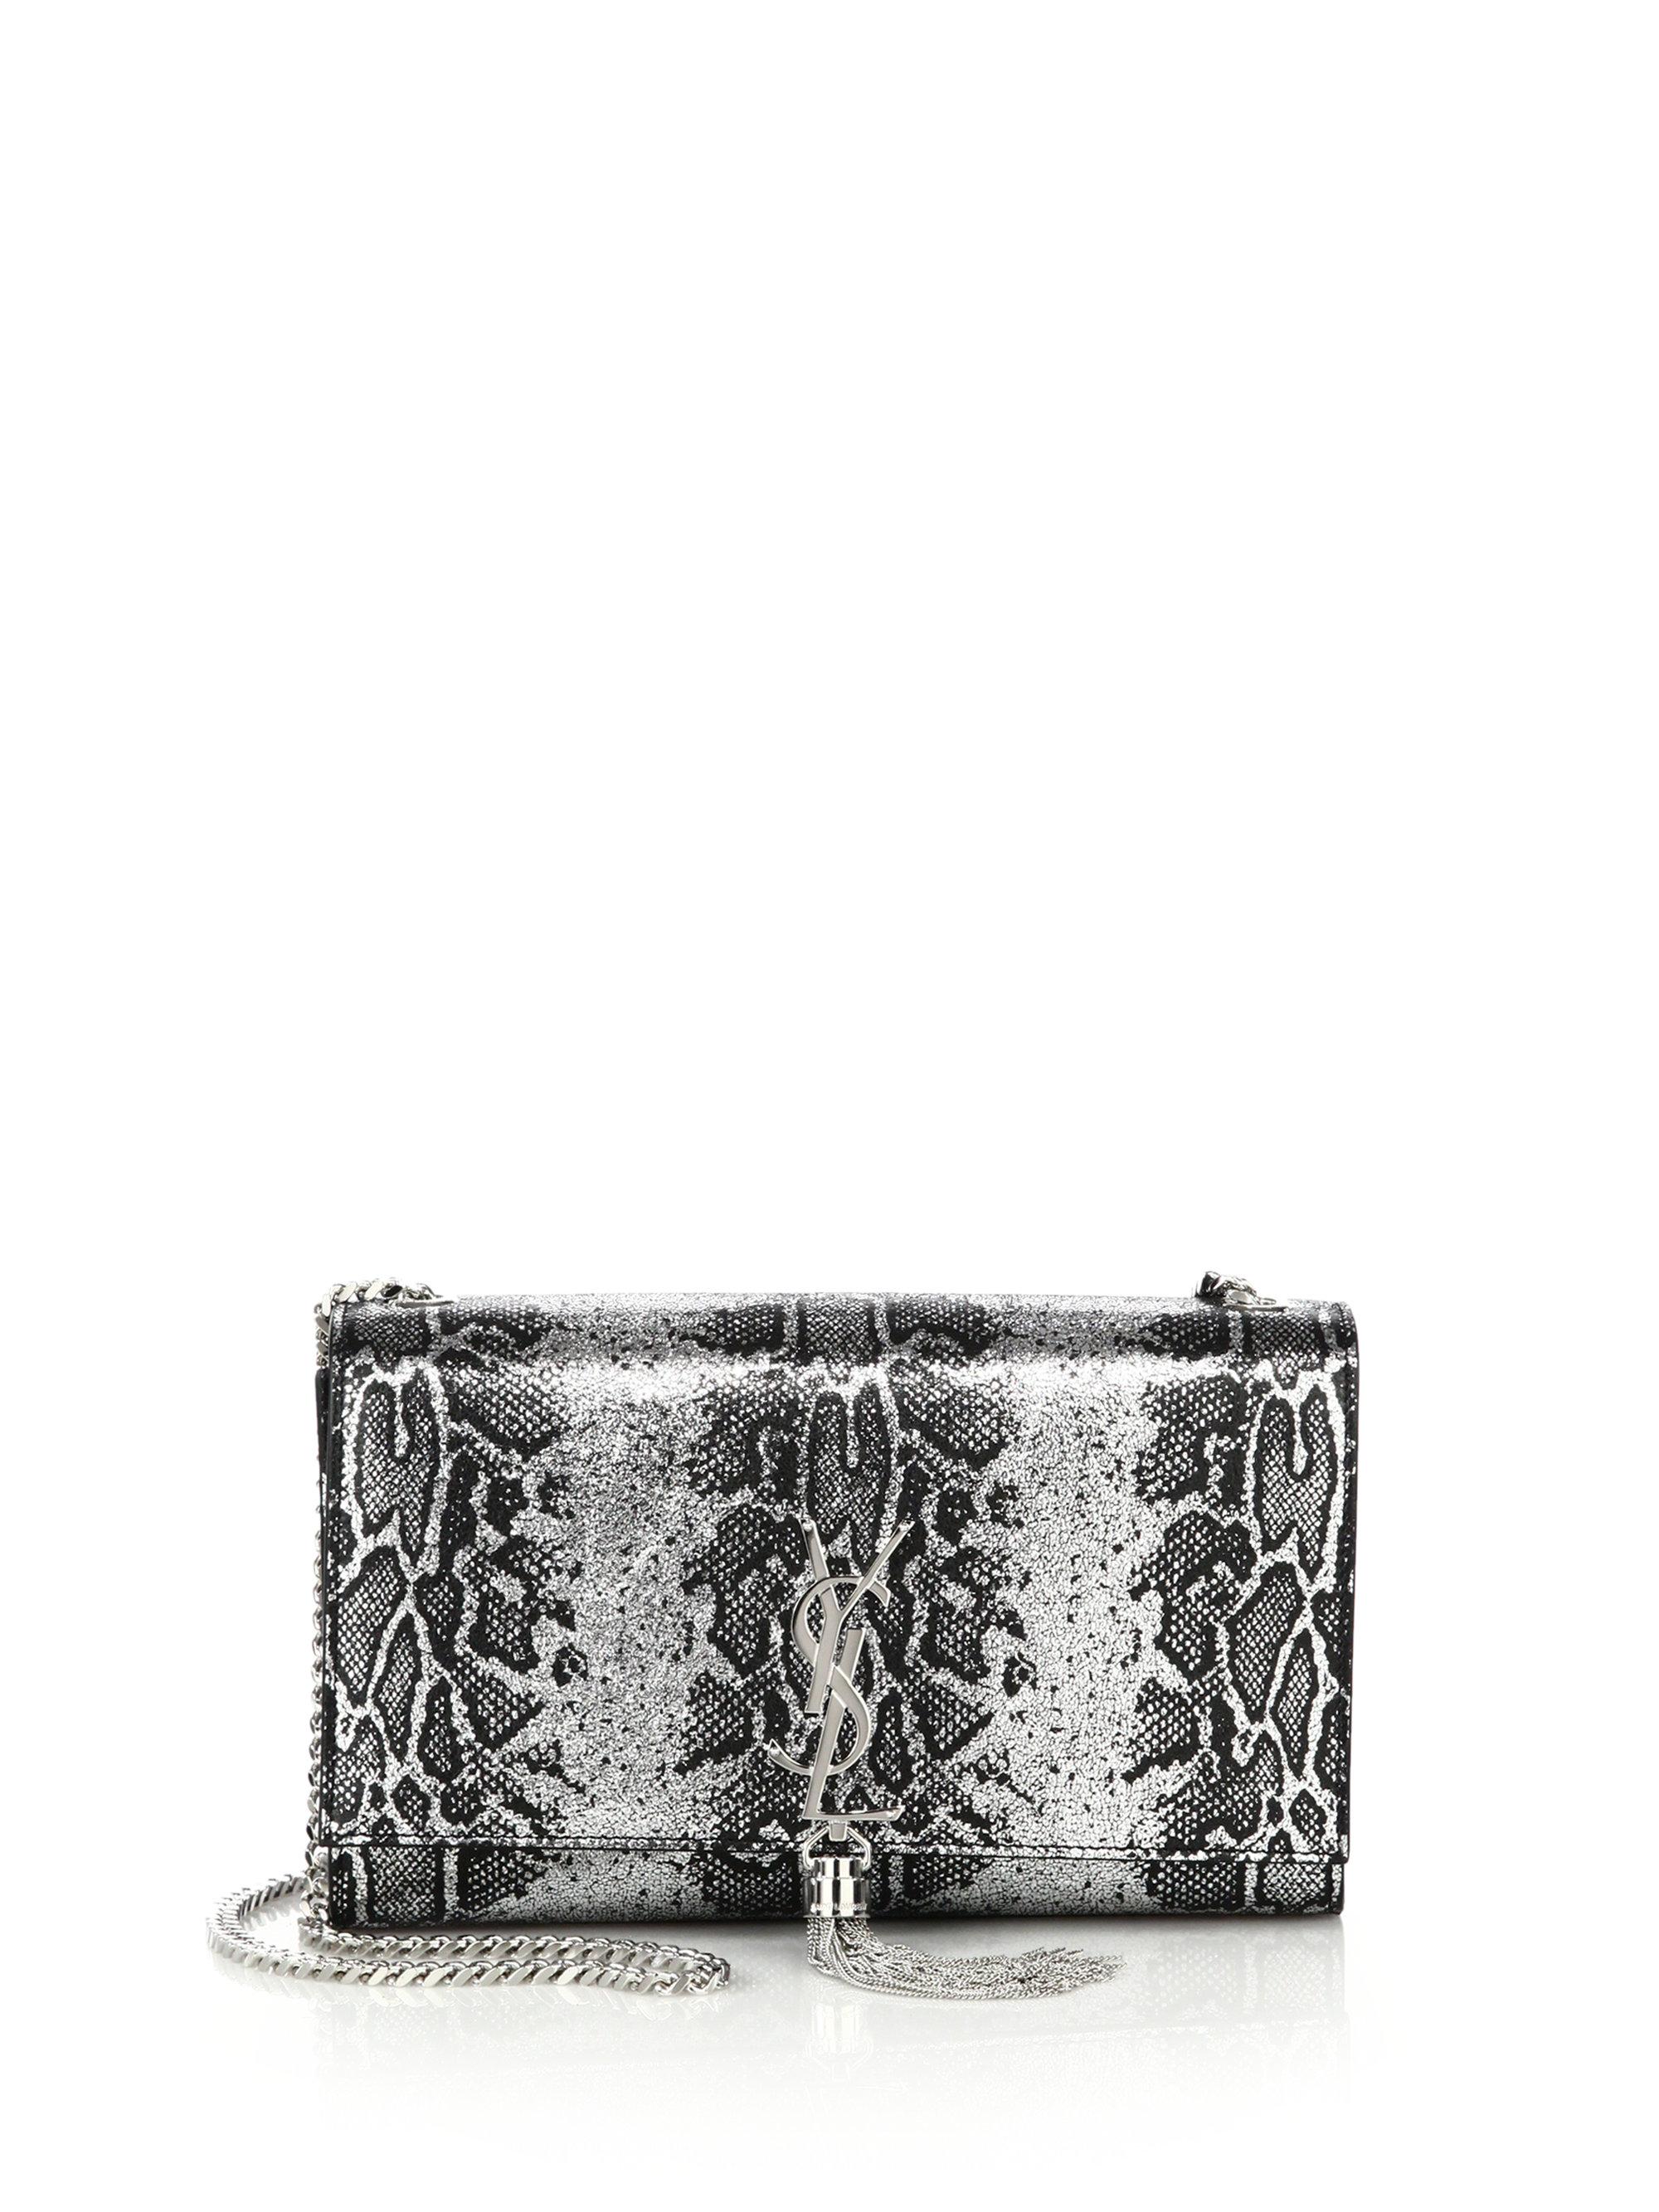 yves st laruent - Saint laurent Monogram Medium Metallic Python-embossed Tassel ...